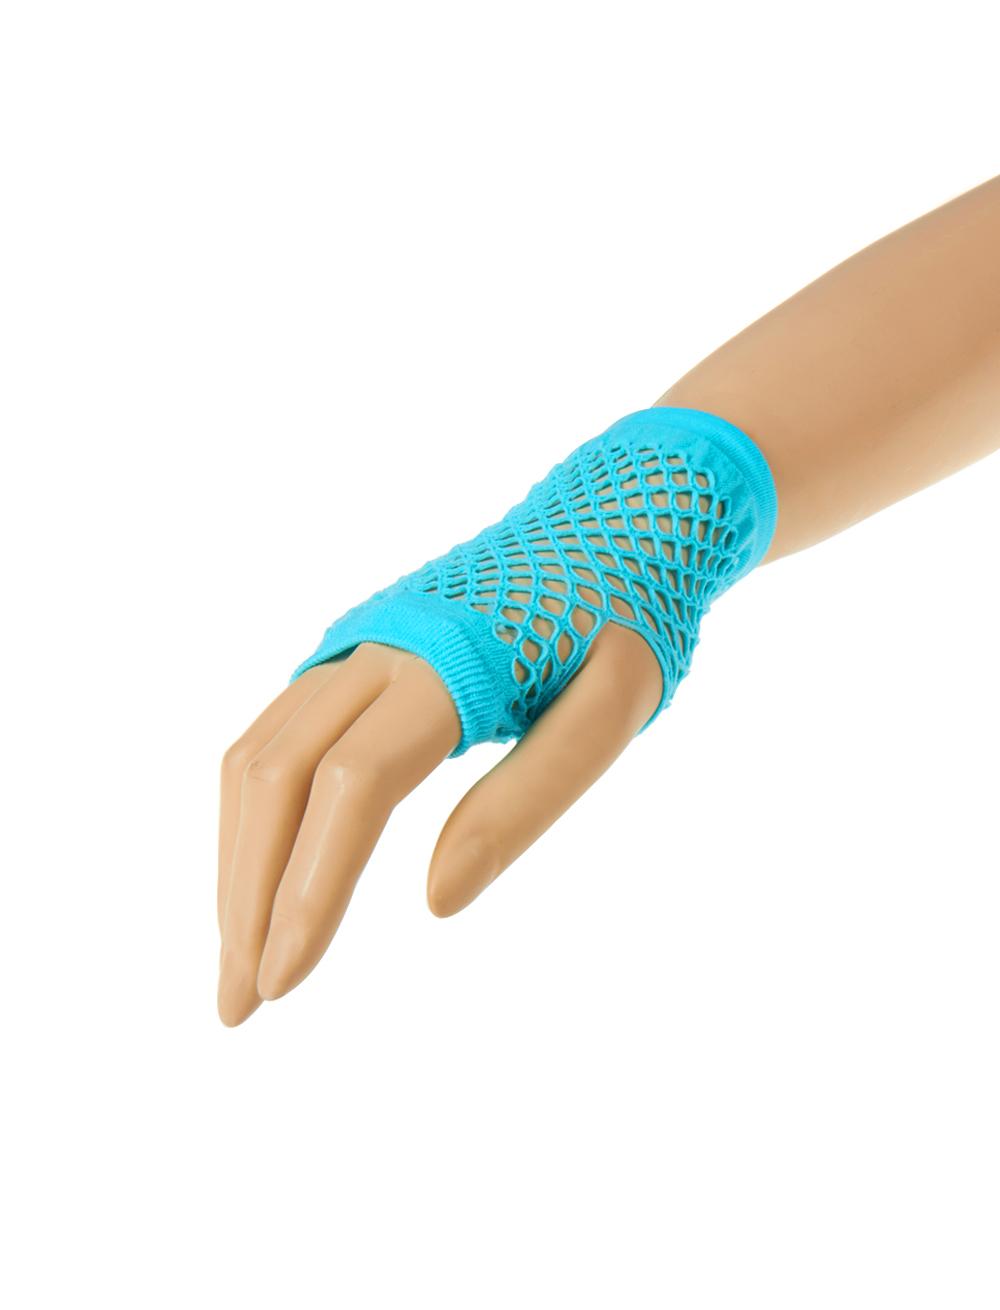 Kostuemzubehor Netzhandschuhe fingerlos kurz tuerkis